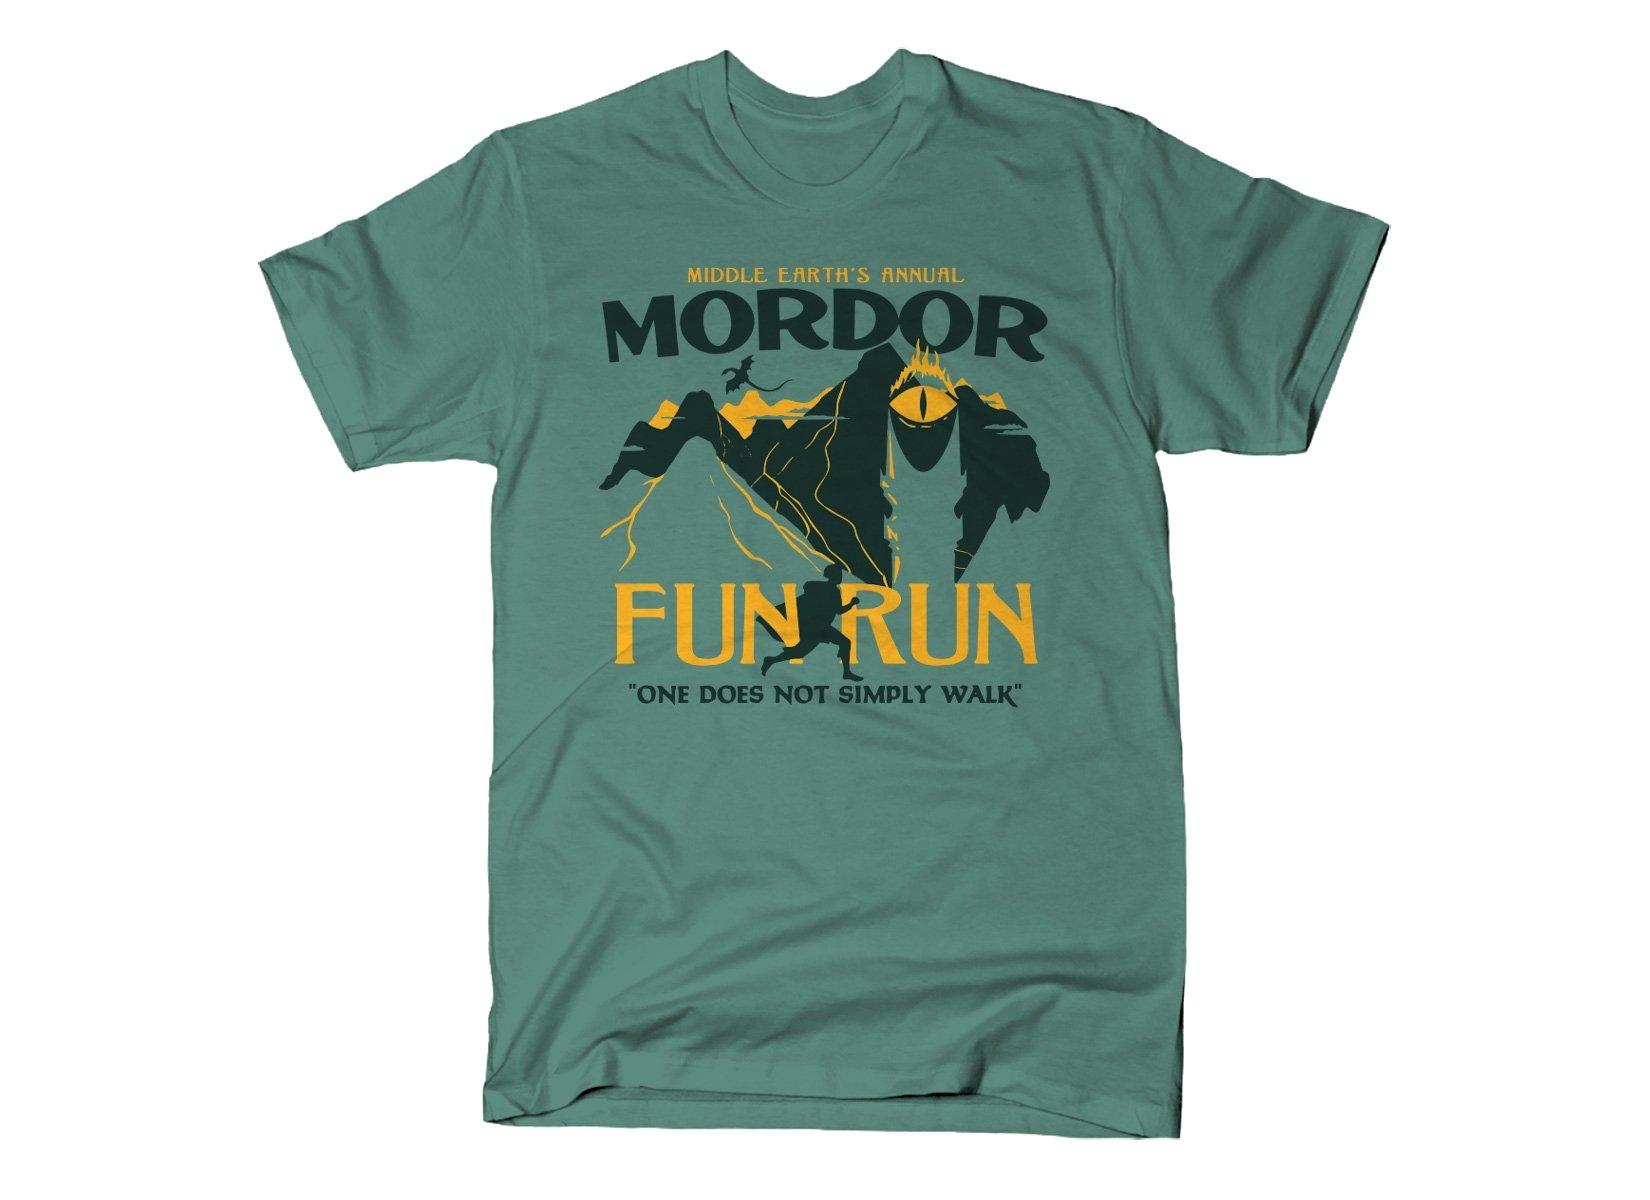 Mordor Fun Run on Mens T-Shirt